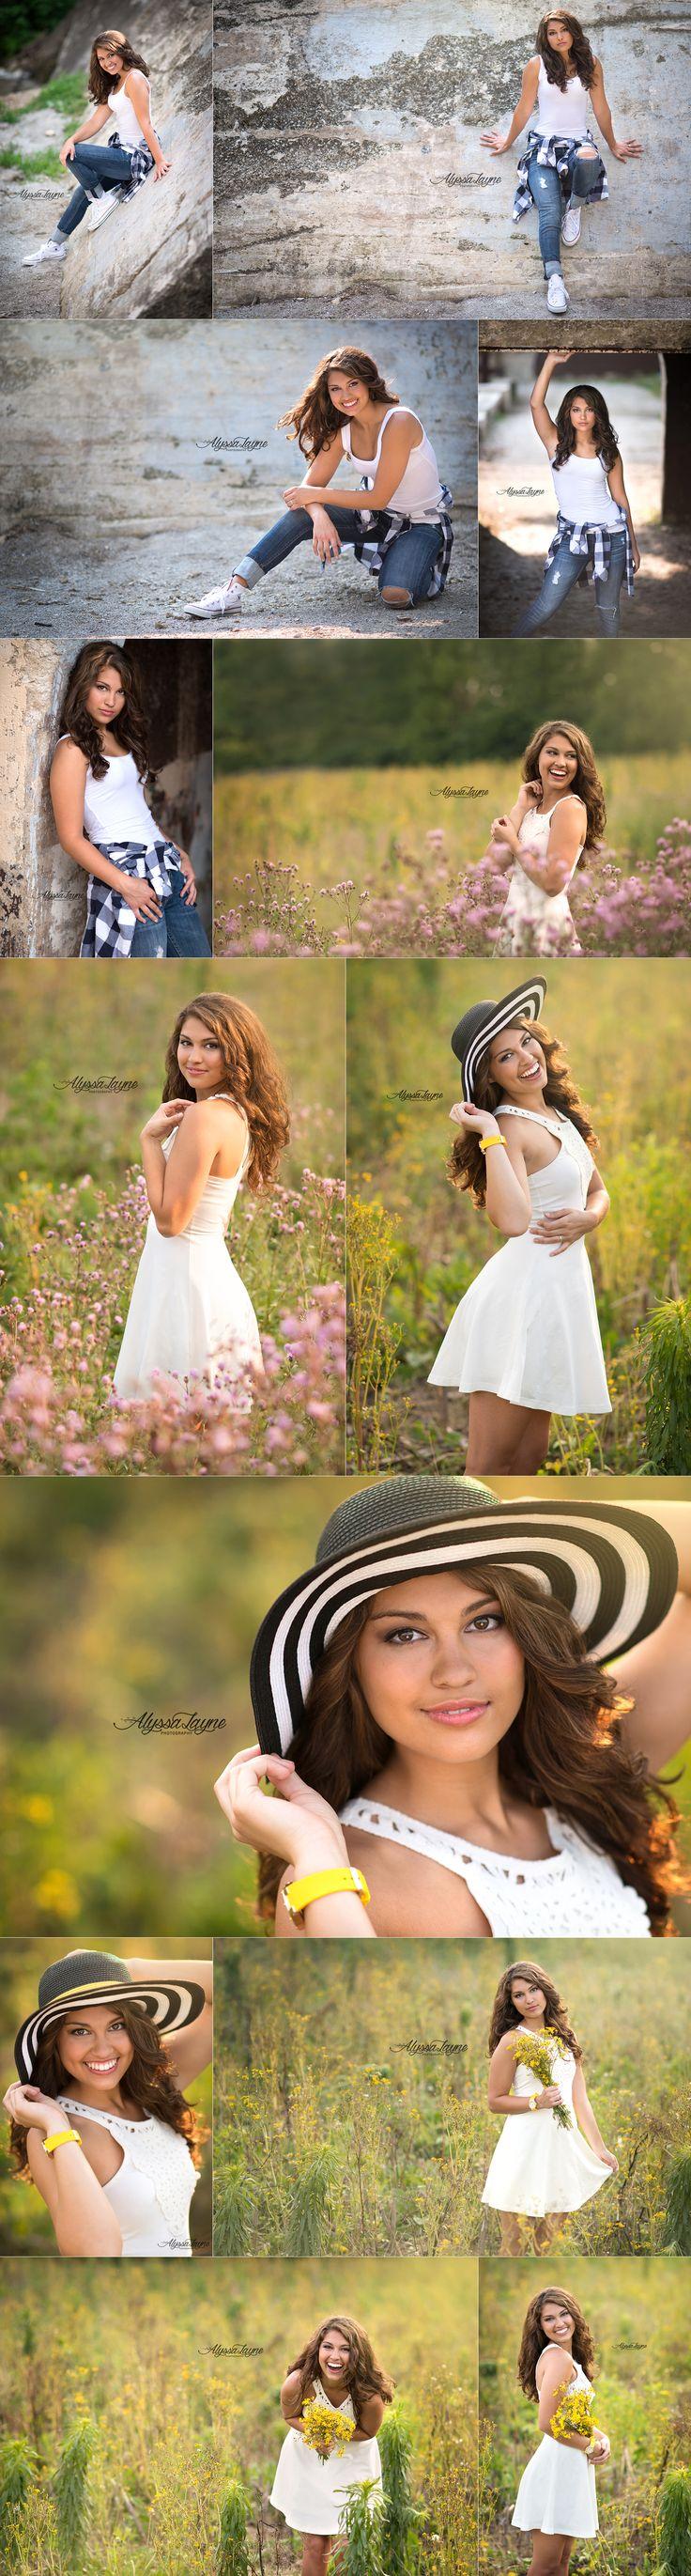 Jessica | Senior Poses | Senior Pictures | Class of 2015 | Illinois Senior Photographer | Alyssa Layne Photography